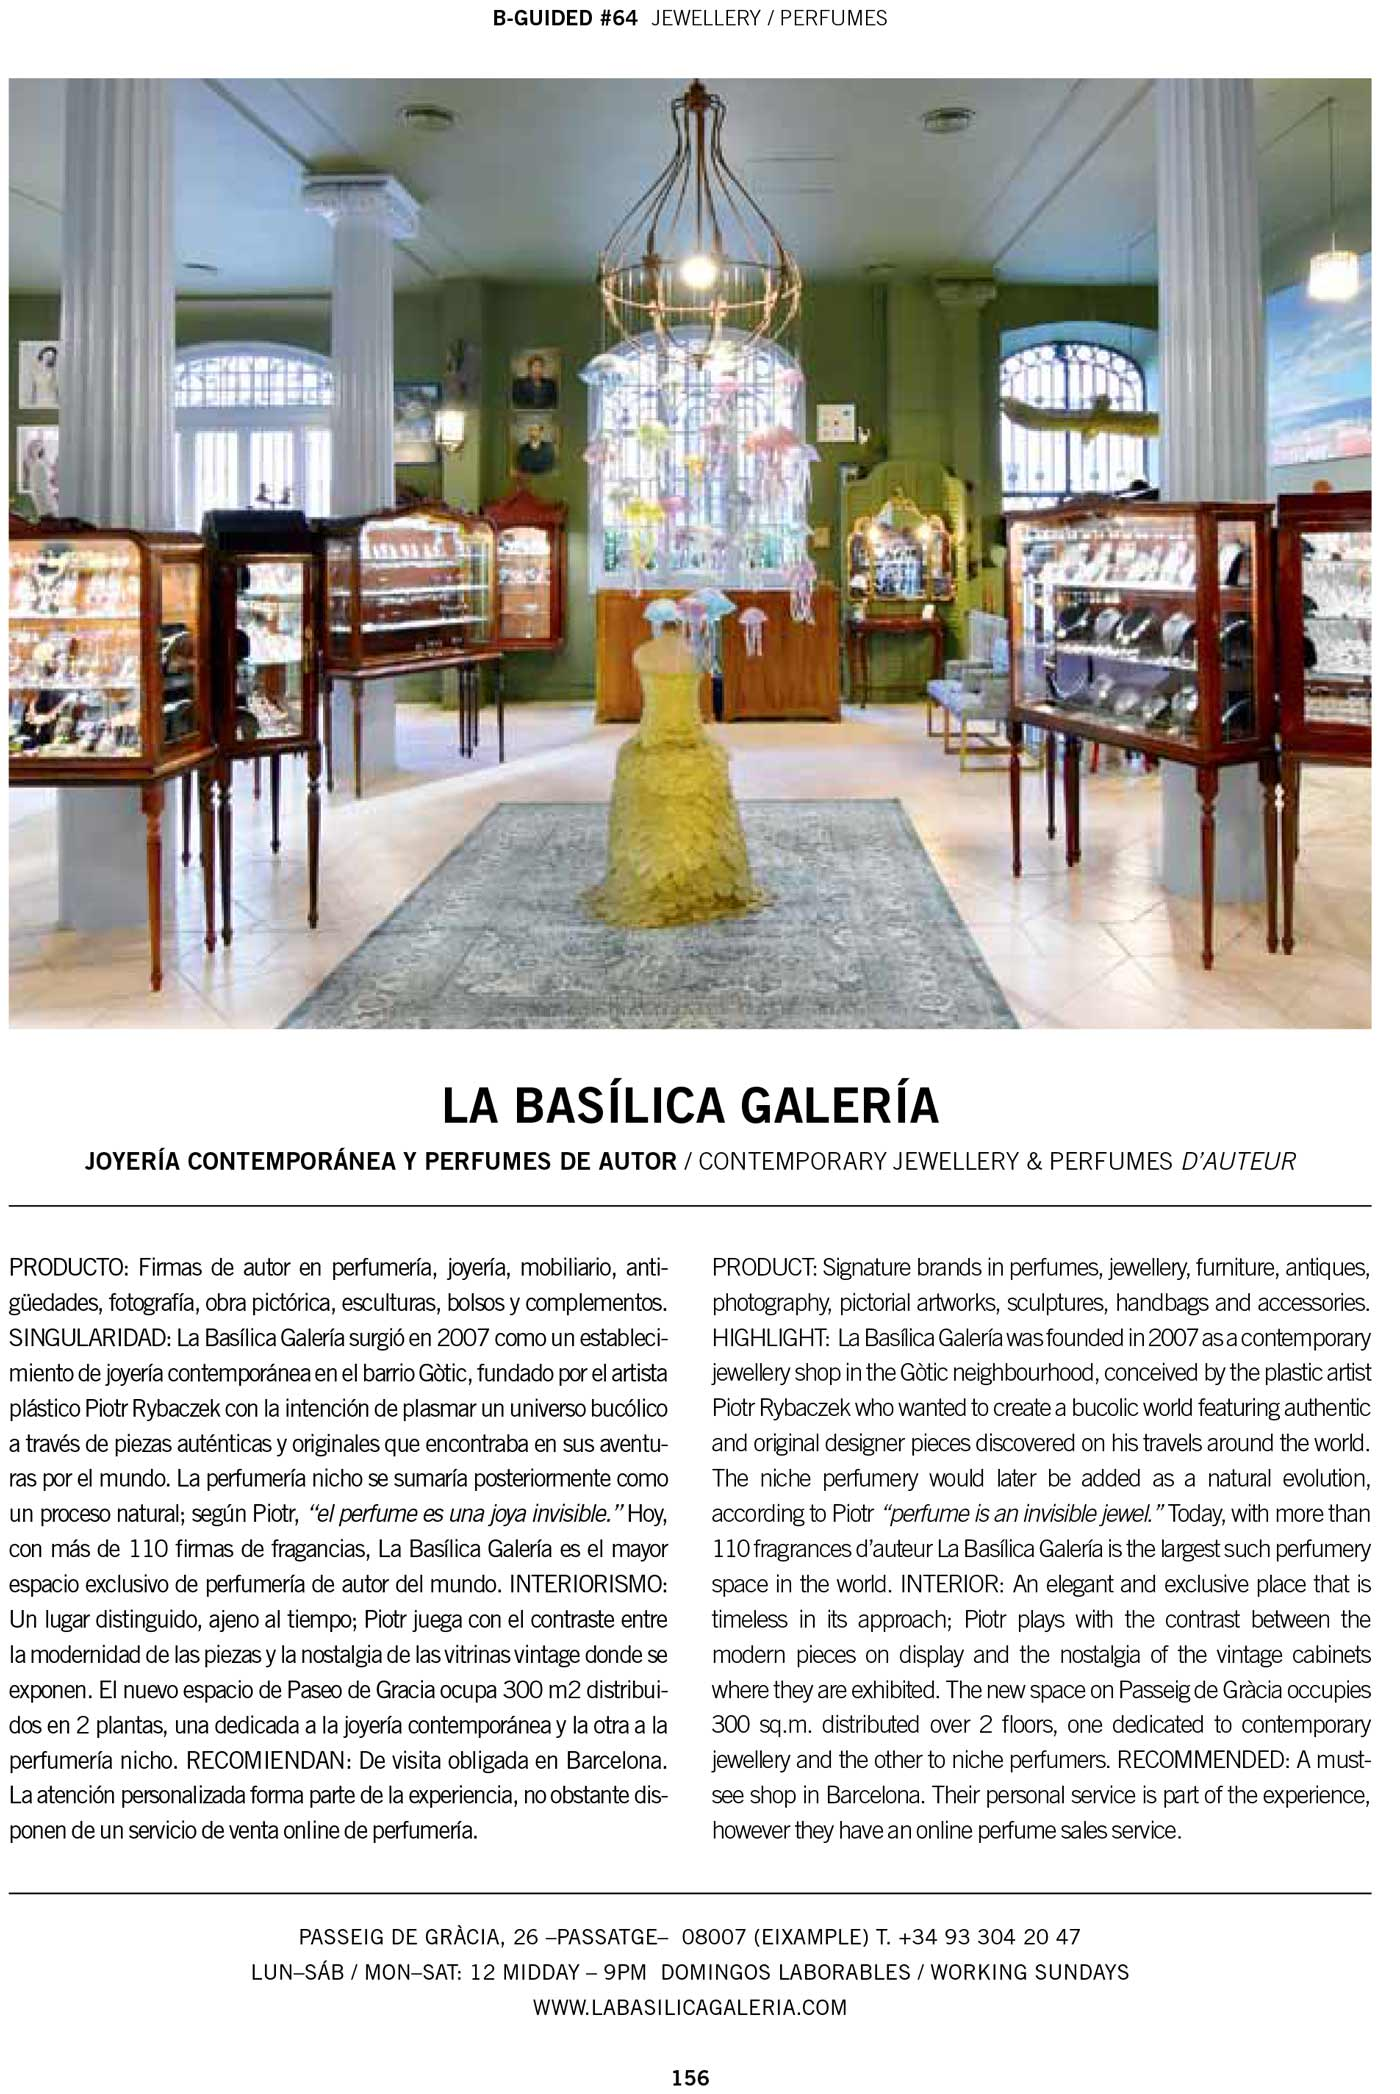 La basilica Prensa en BGuided 74